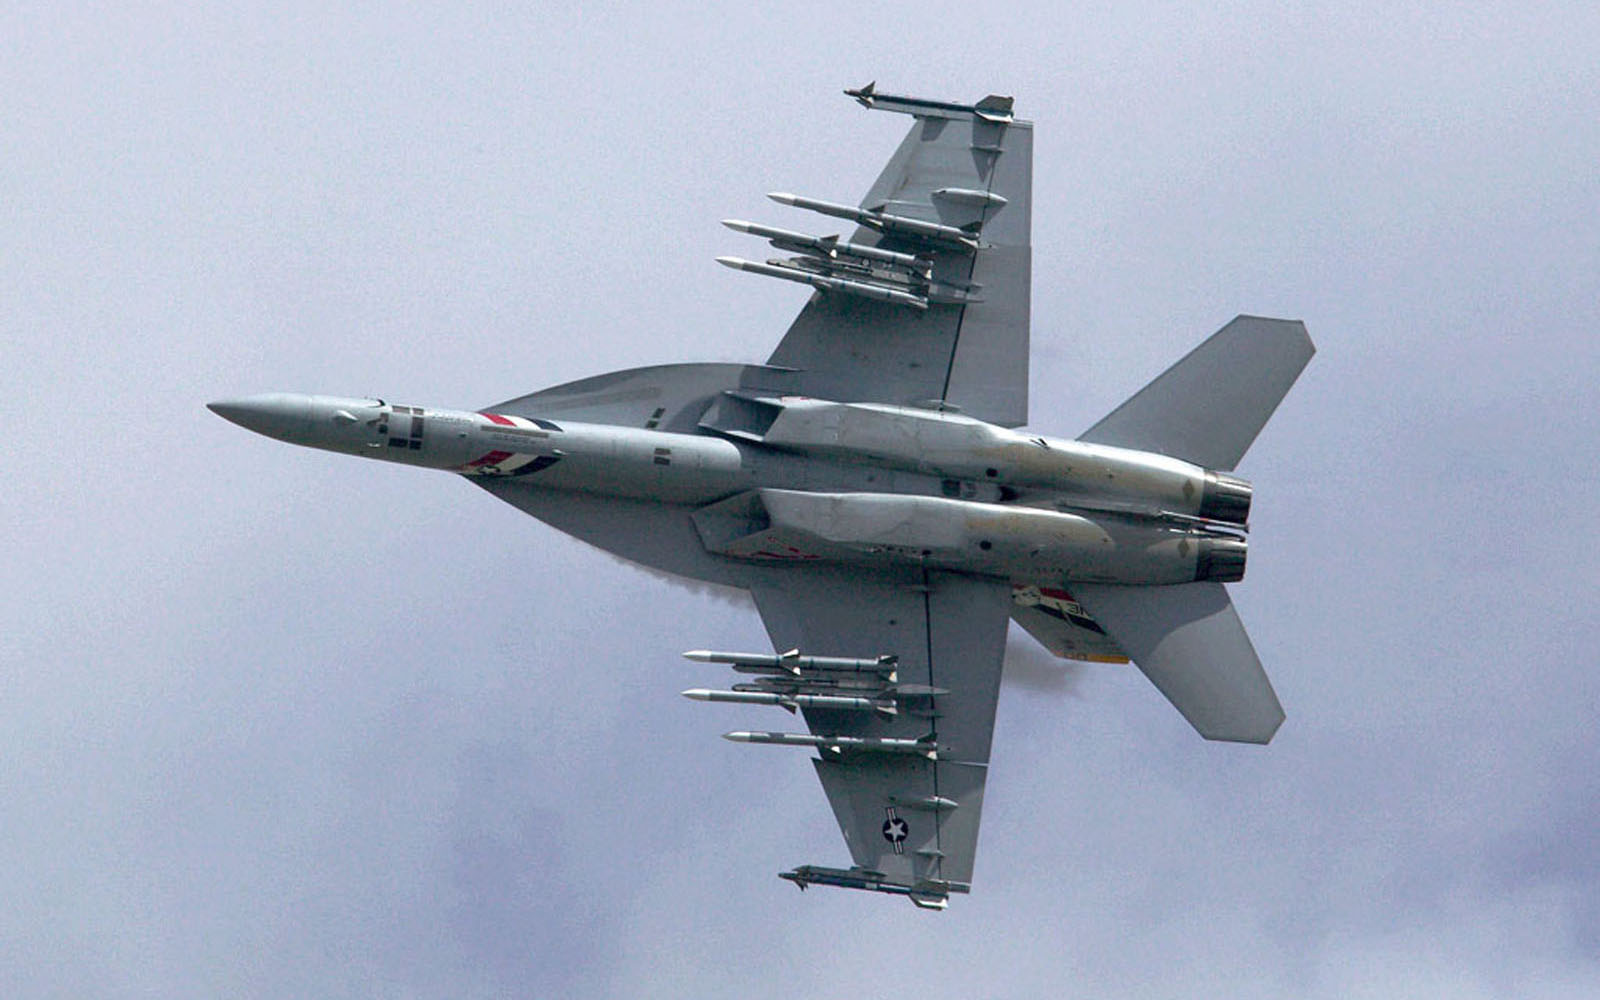 wallpapers F A 18F Super Hornet Aircraft Wallpapers 1600x1000